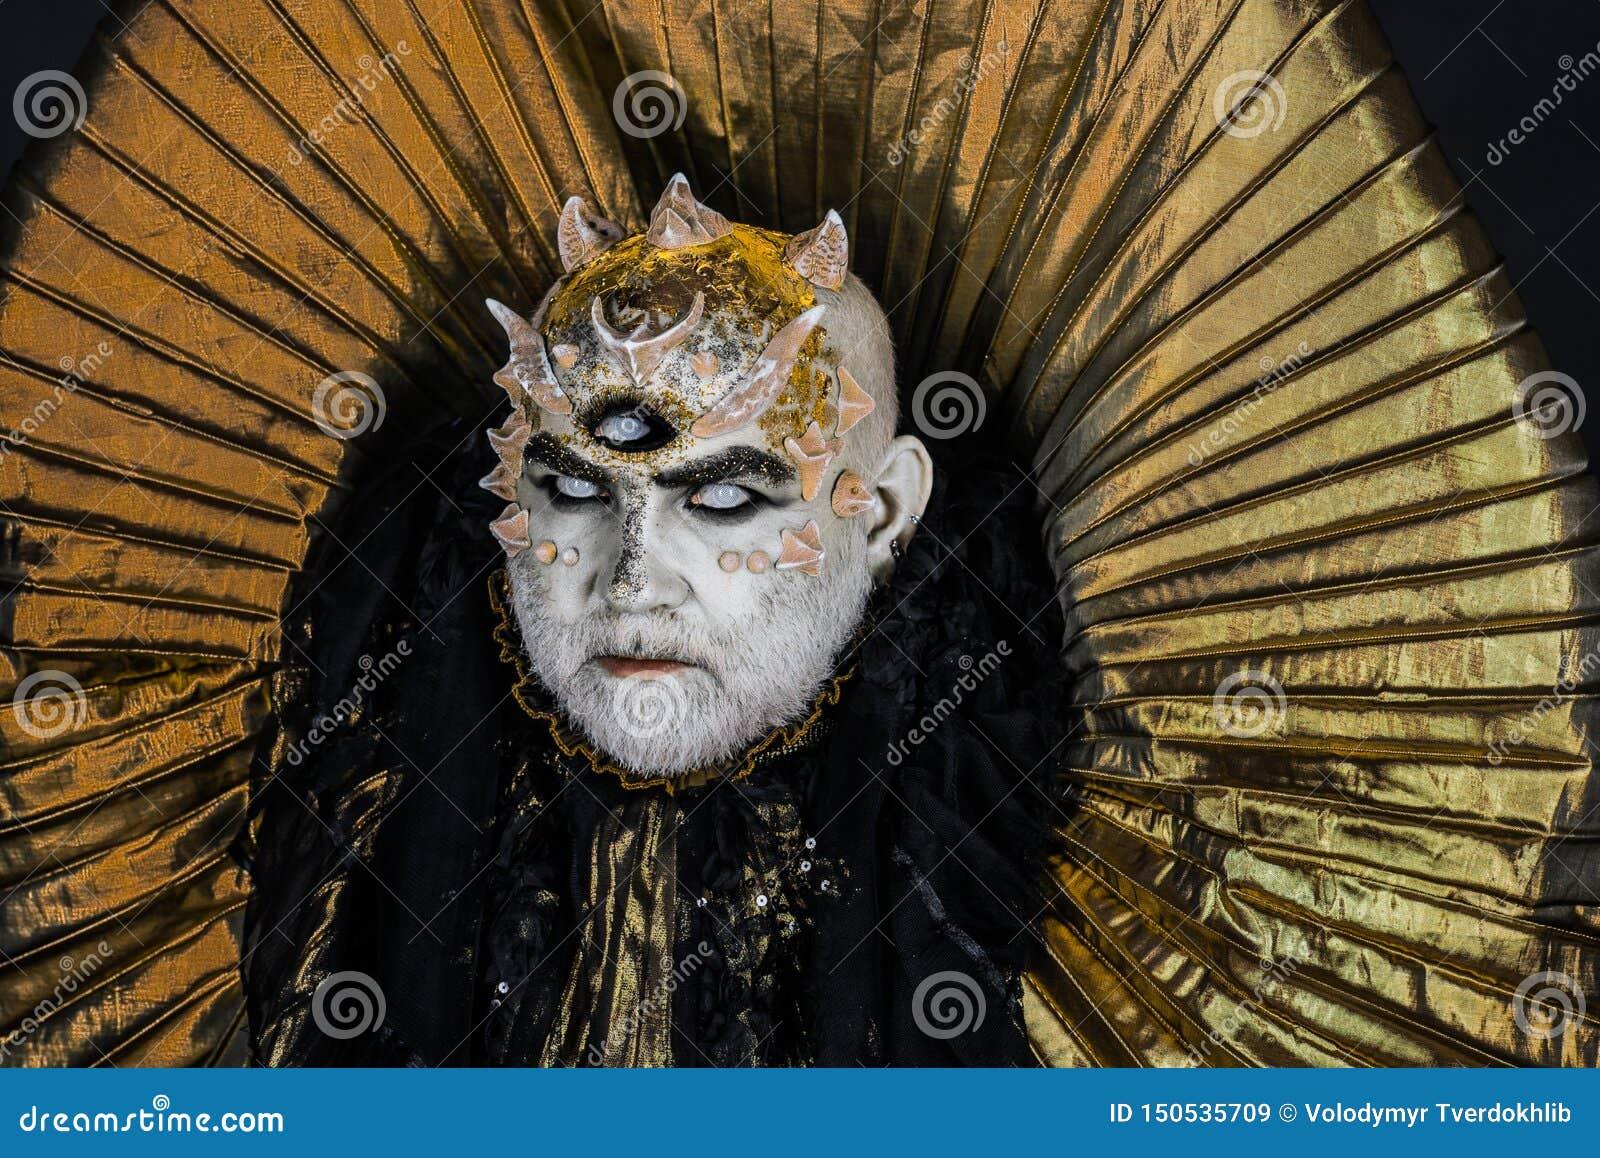 Man with third eye, thorns or warts. Senior man with white beard dressed like monster. Alien, demon, sorcerer makeup